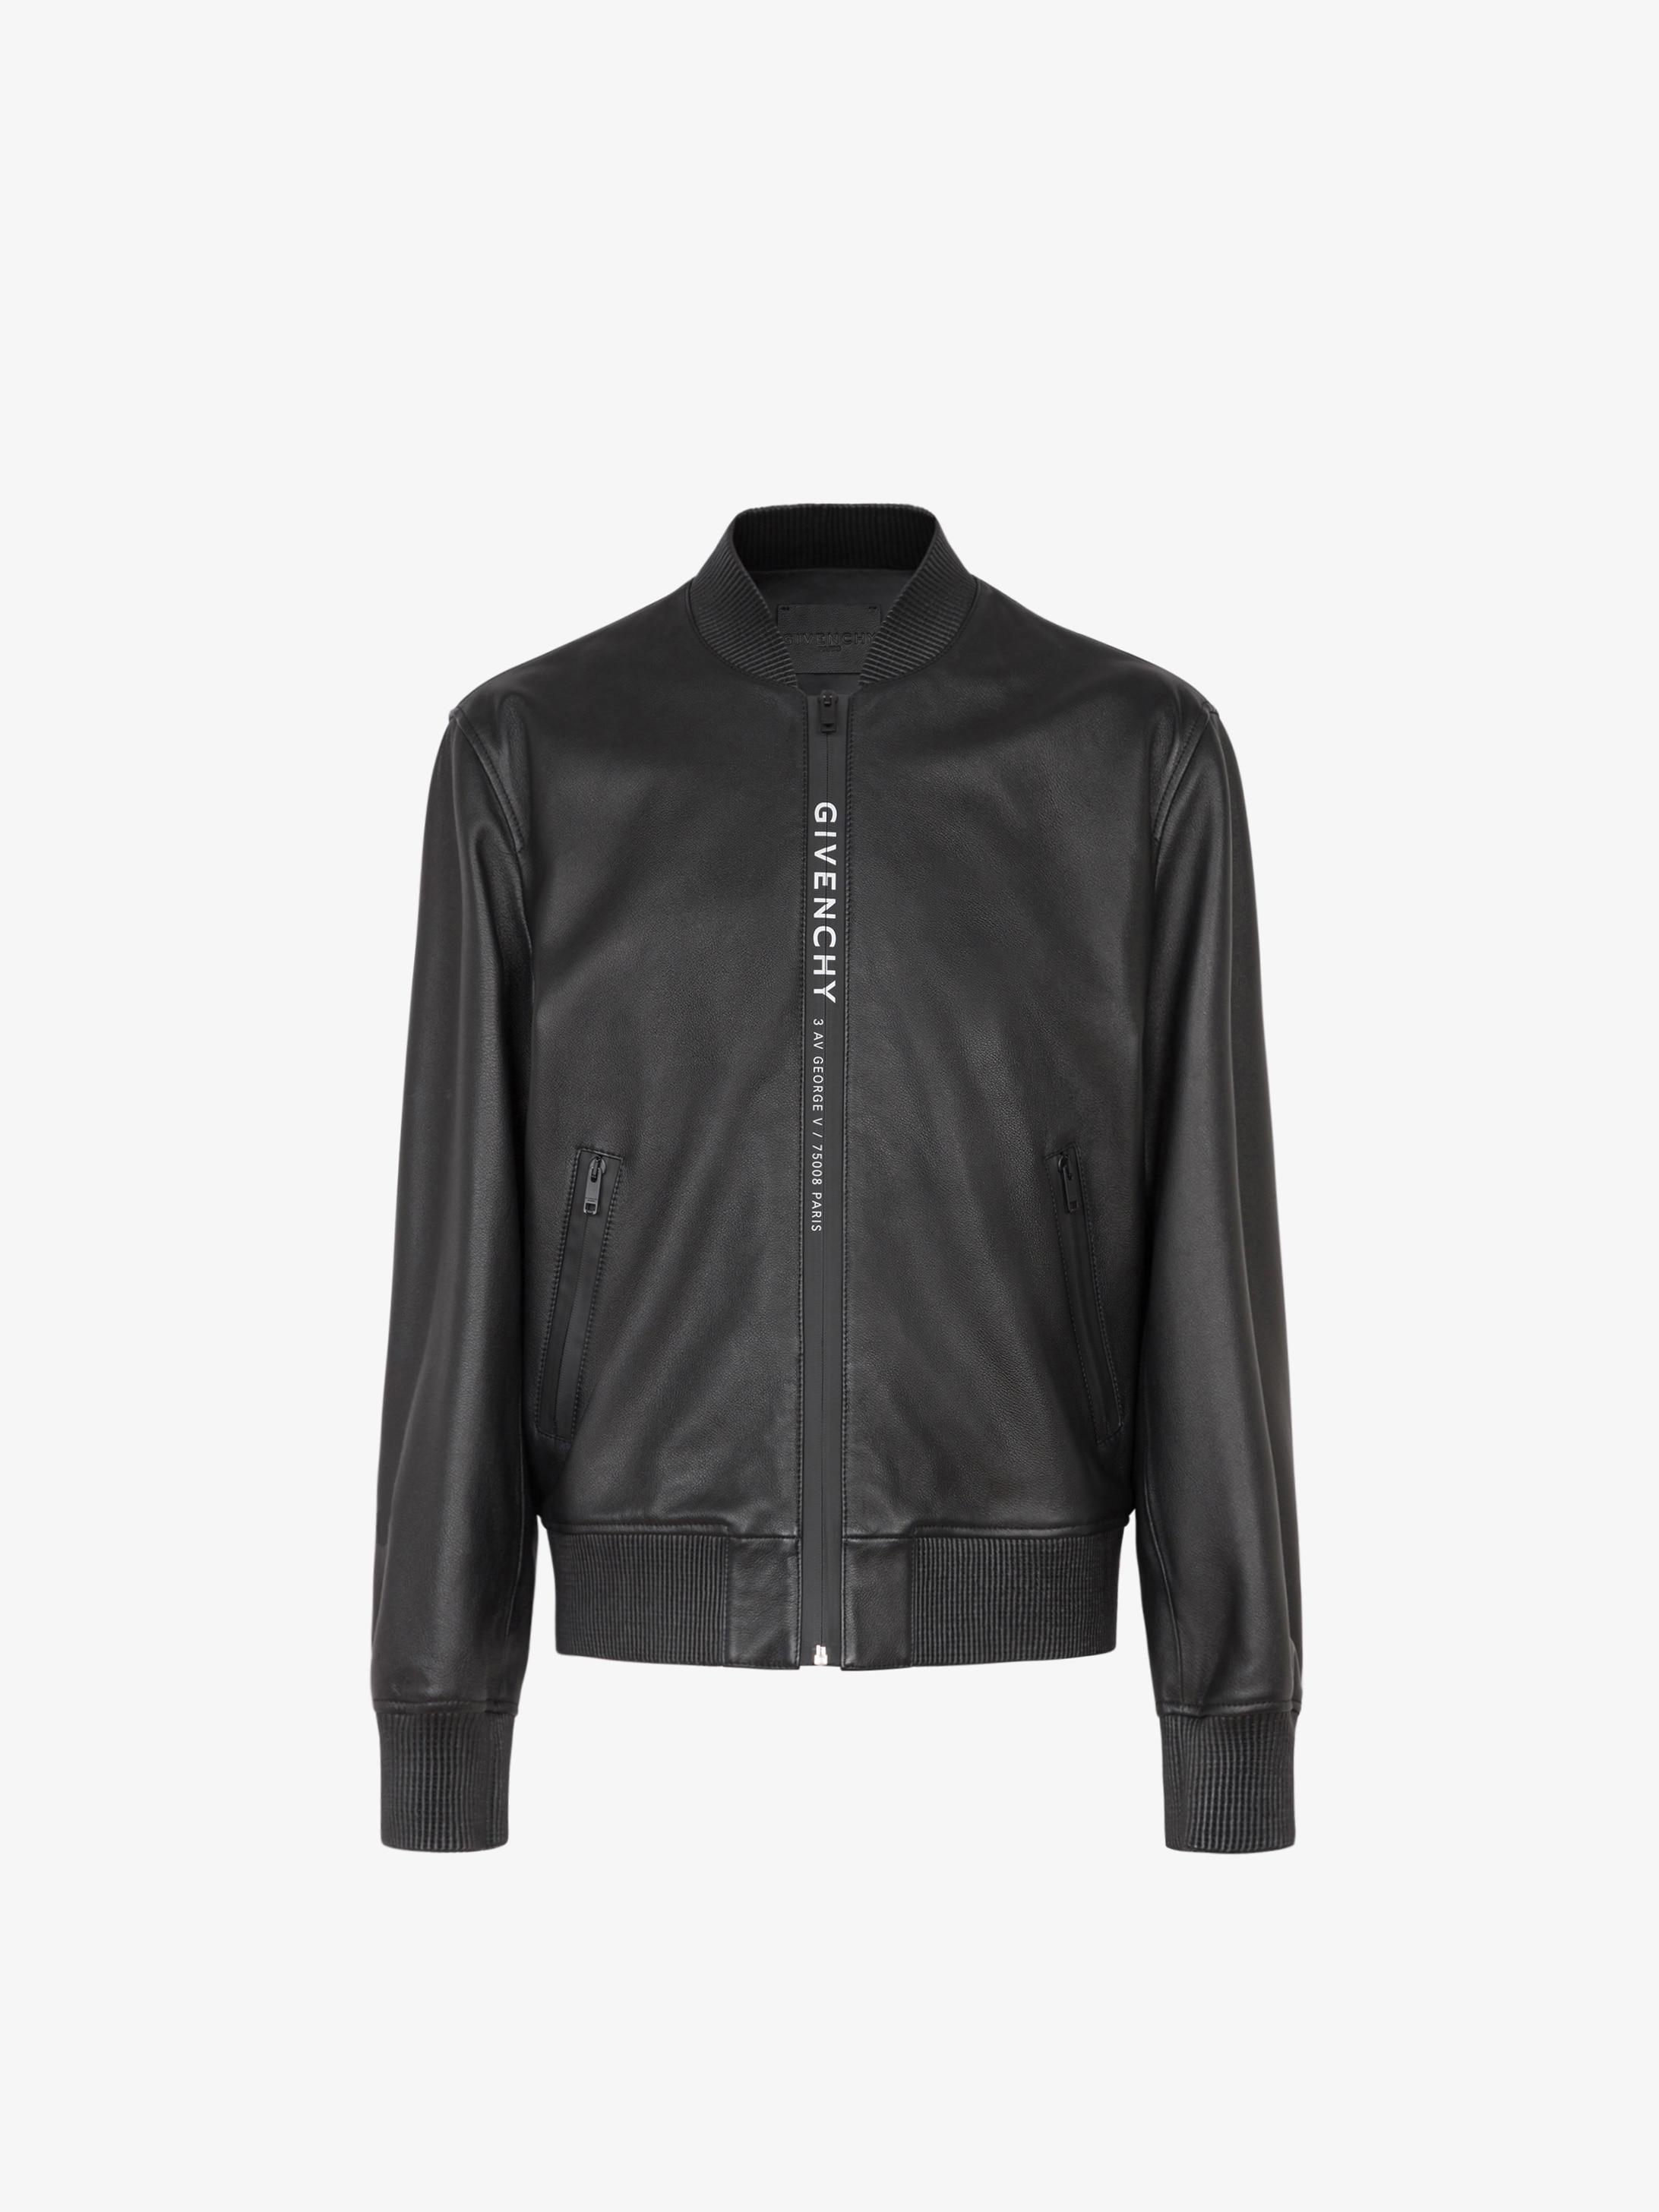 GIVENCHY ADDRESS webbing bomber jacket in leather